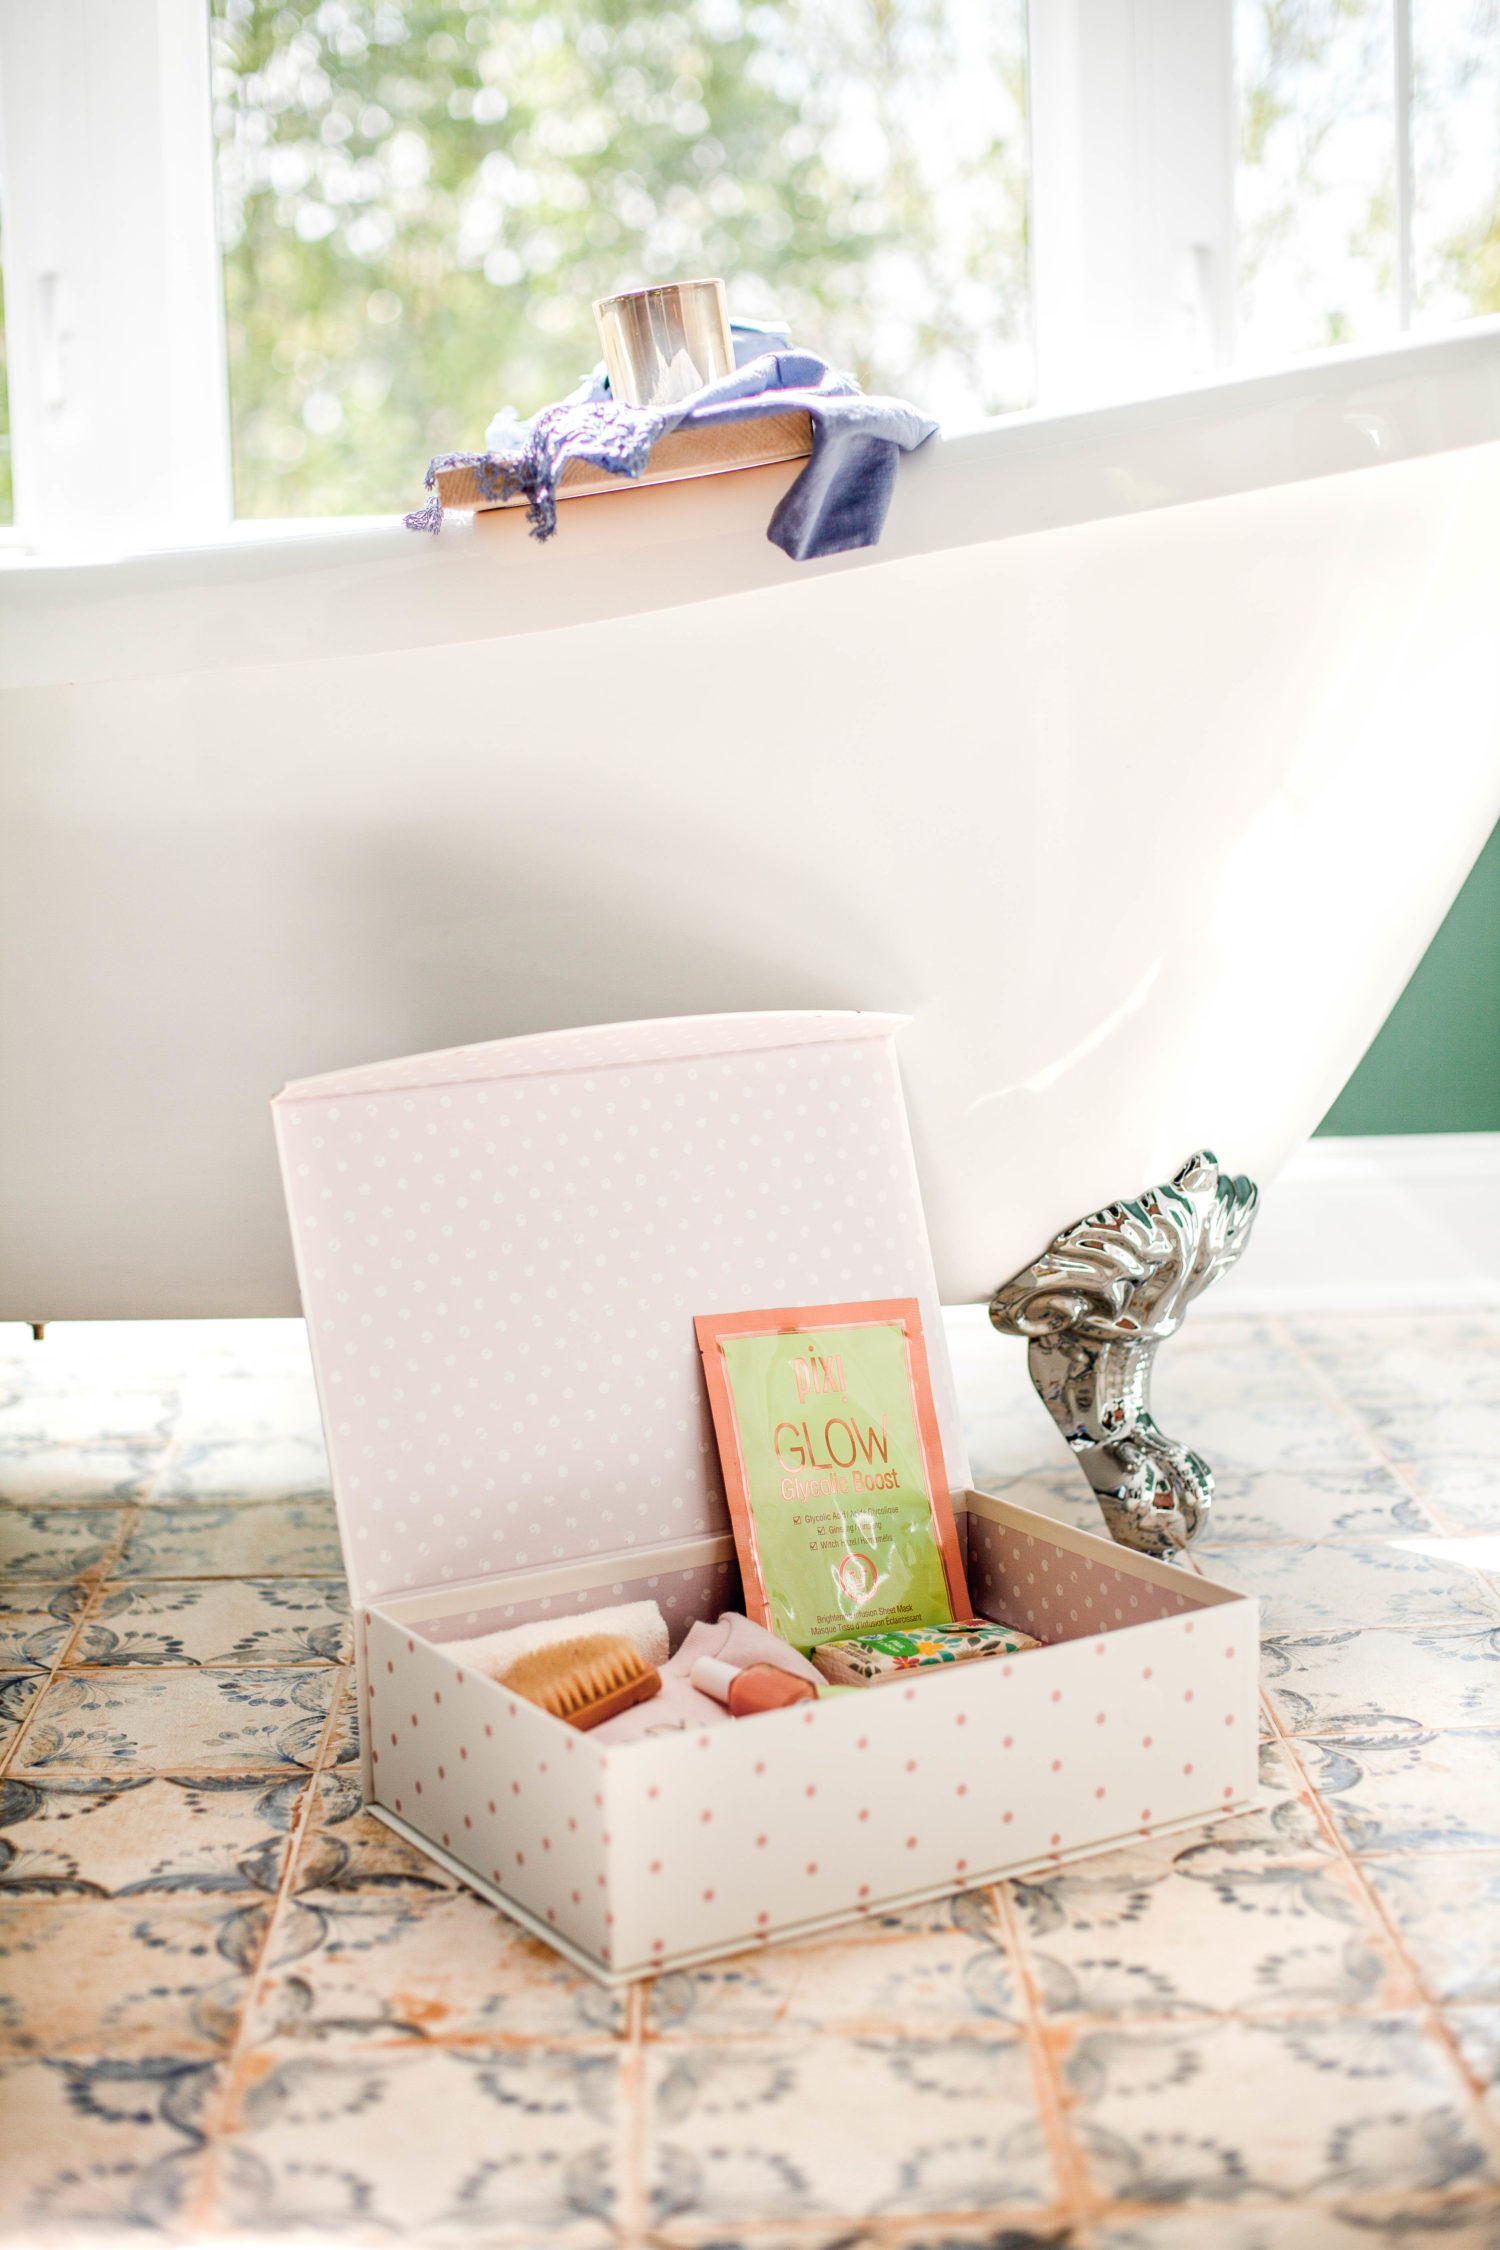 How To Make A Self-Care Box